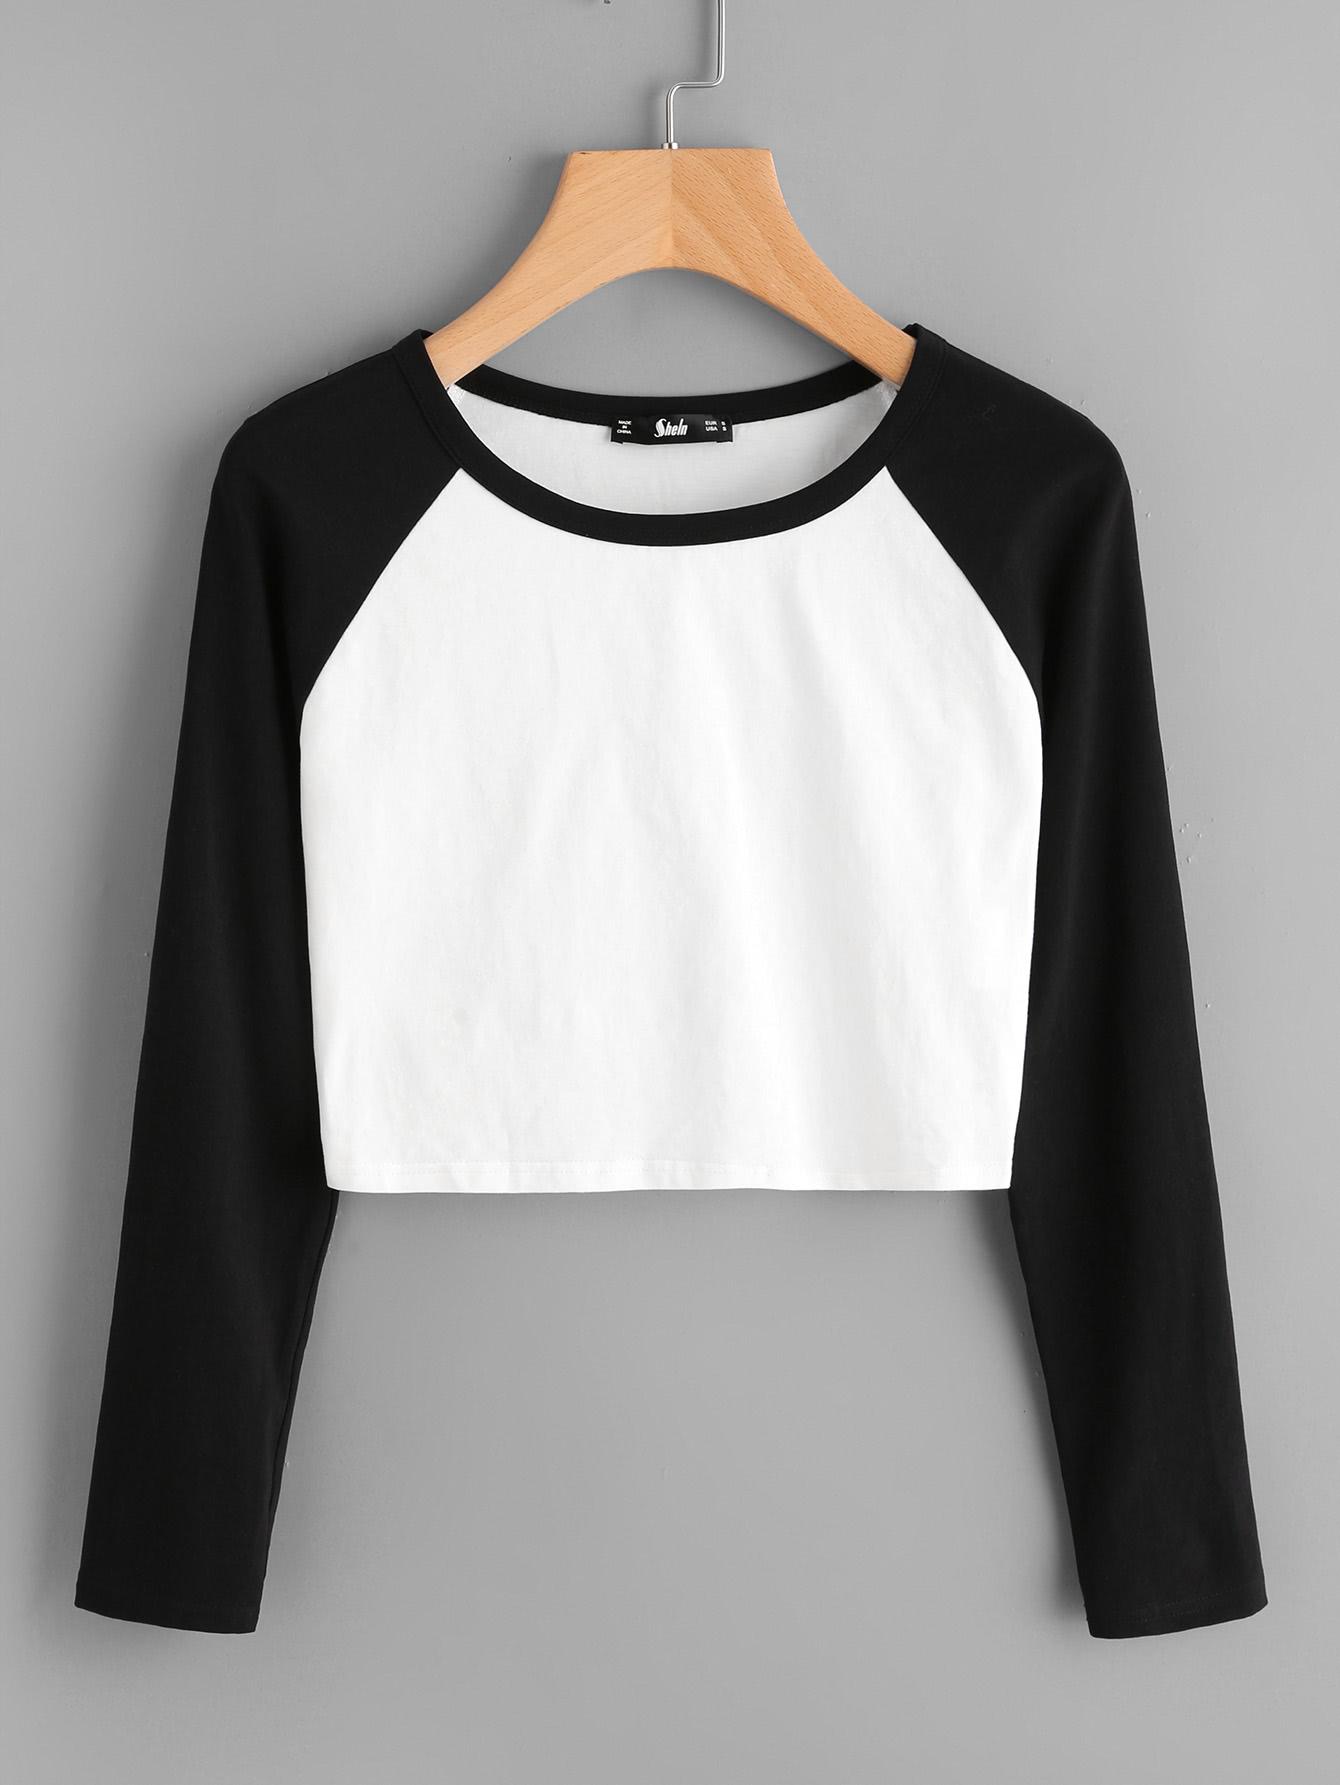 Blusa femenina 2015 verano tops para mujer camisa oficina